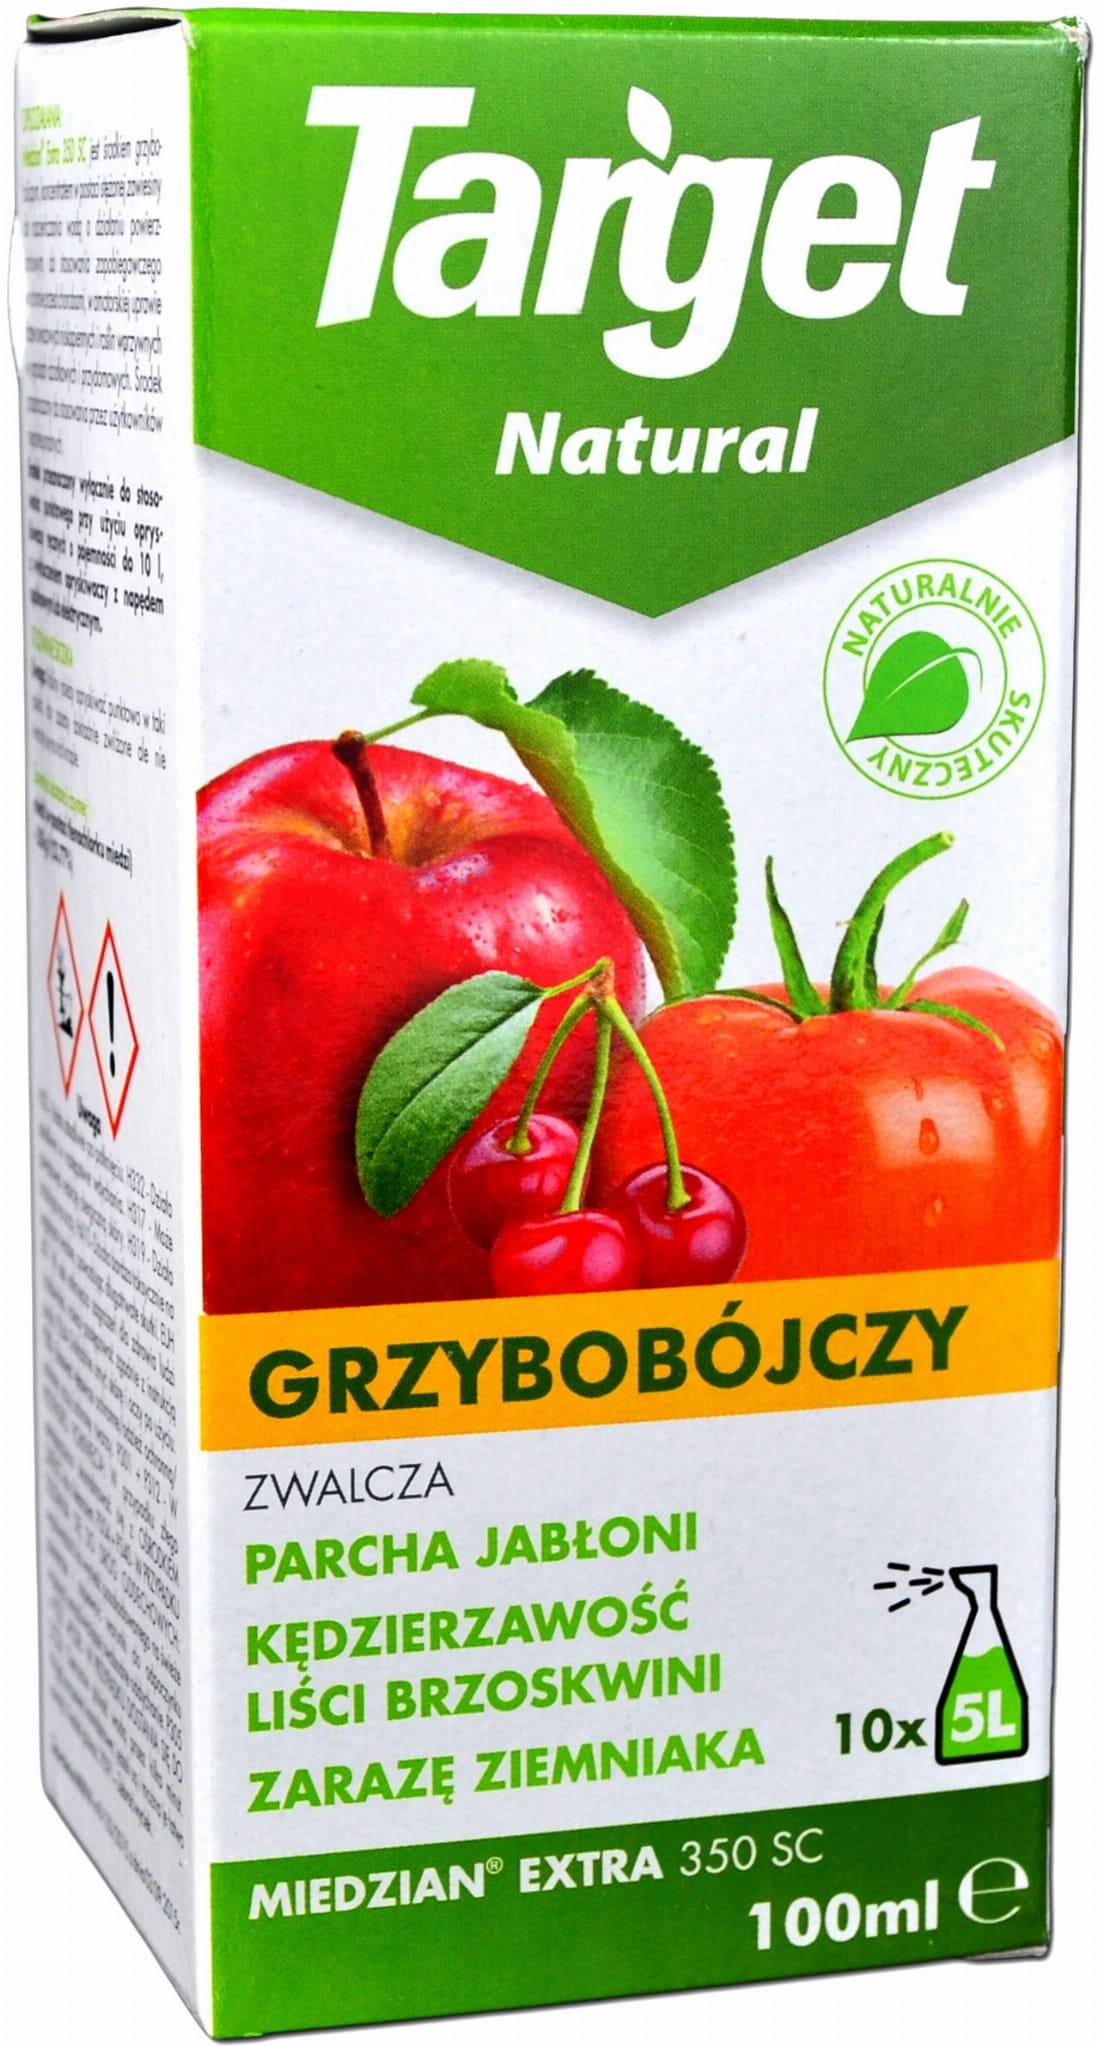 Target Natural Miedzian Extra 350 Sl 100ml Na 50l Semer Sklep Ogrodniczy